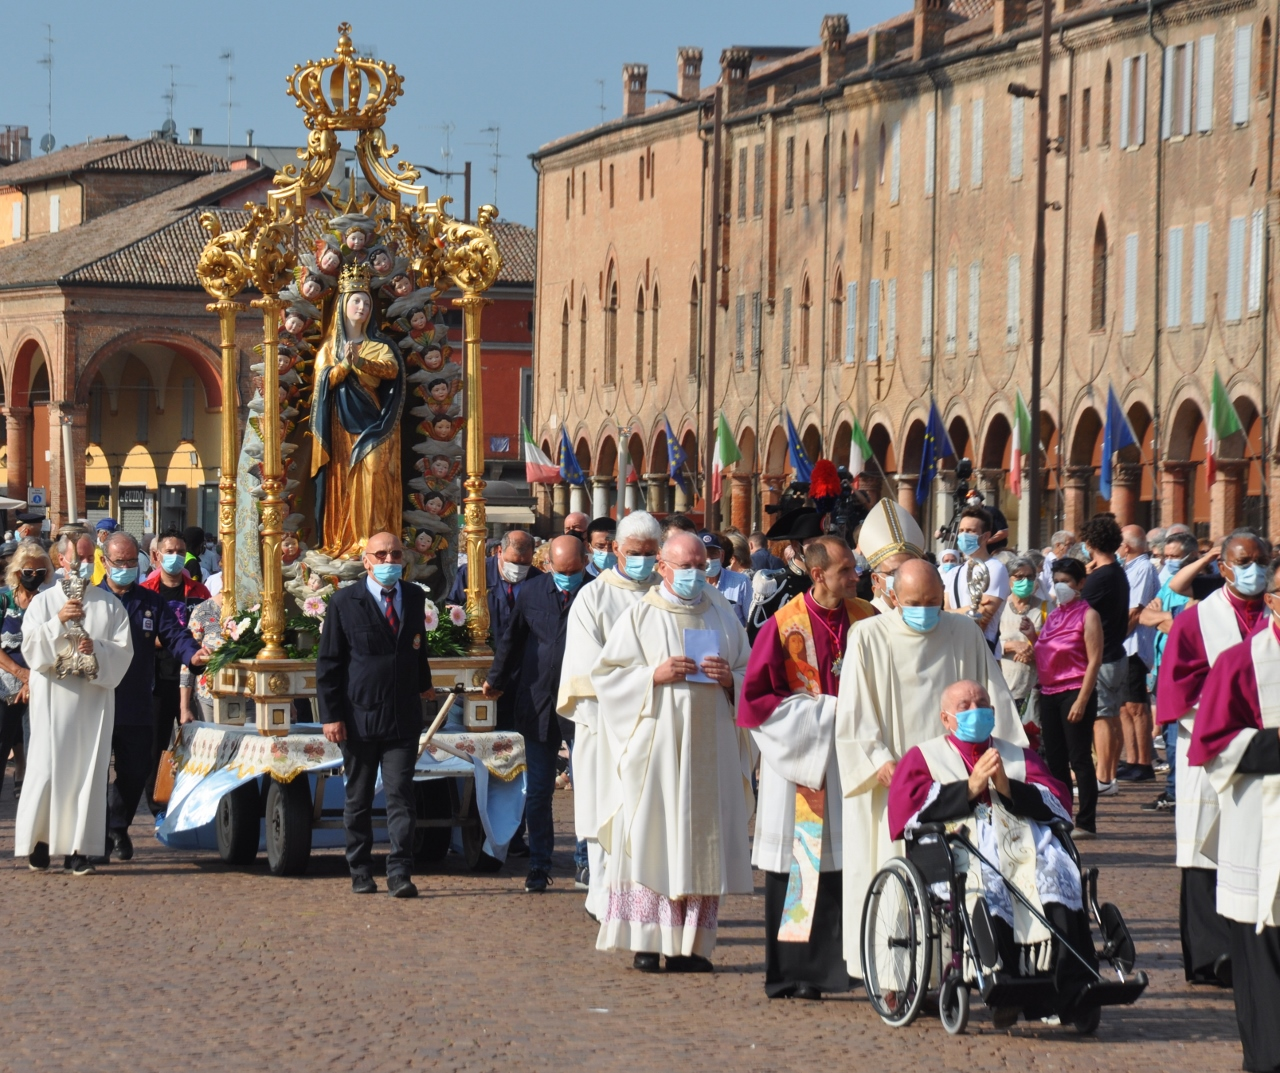 La Chiesa di Carpi celebra la Madonna Assunta